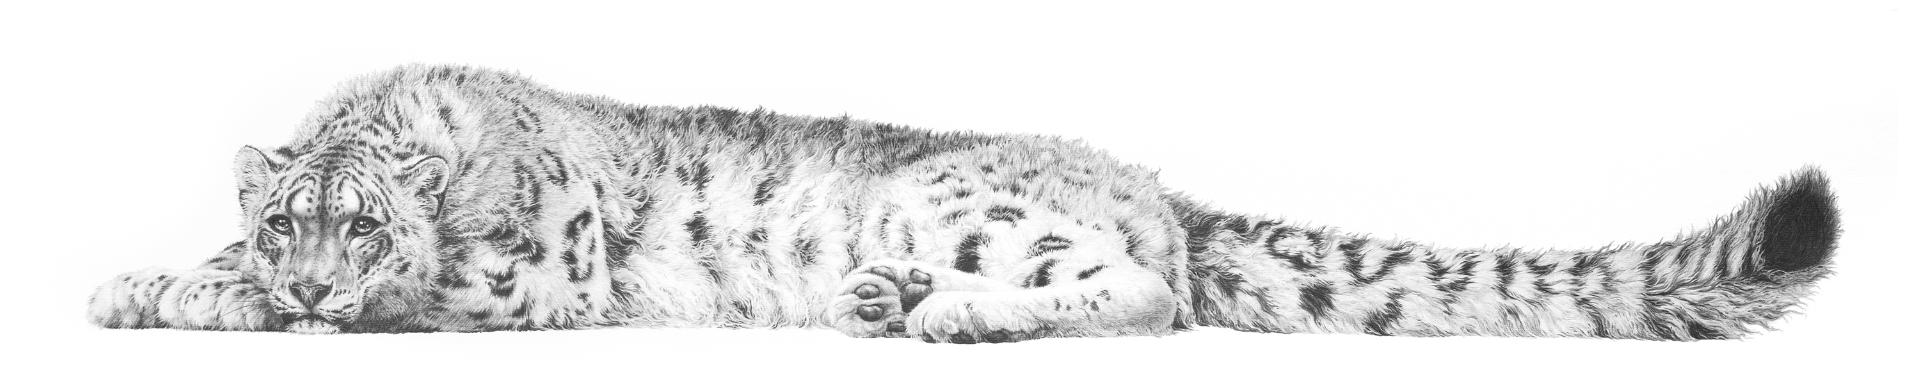 Snow leopard 1993